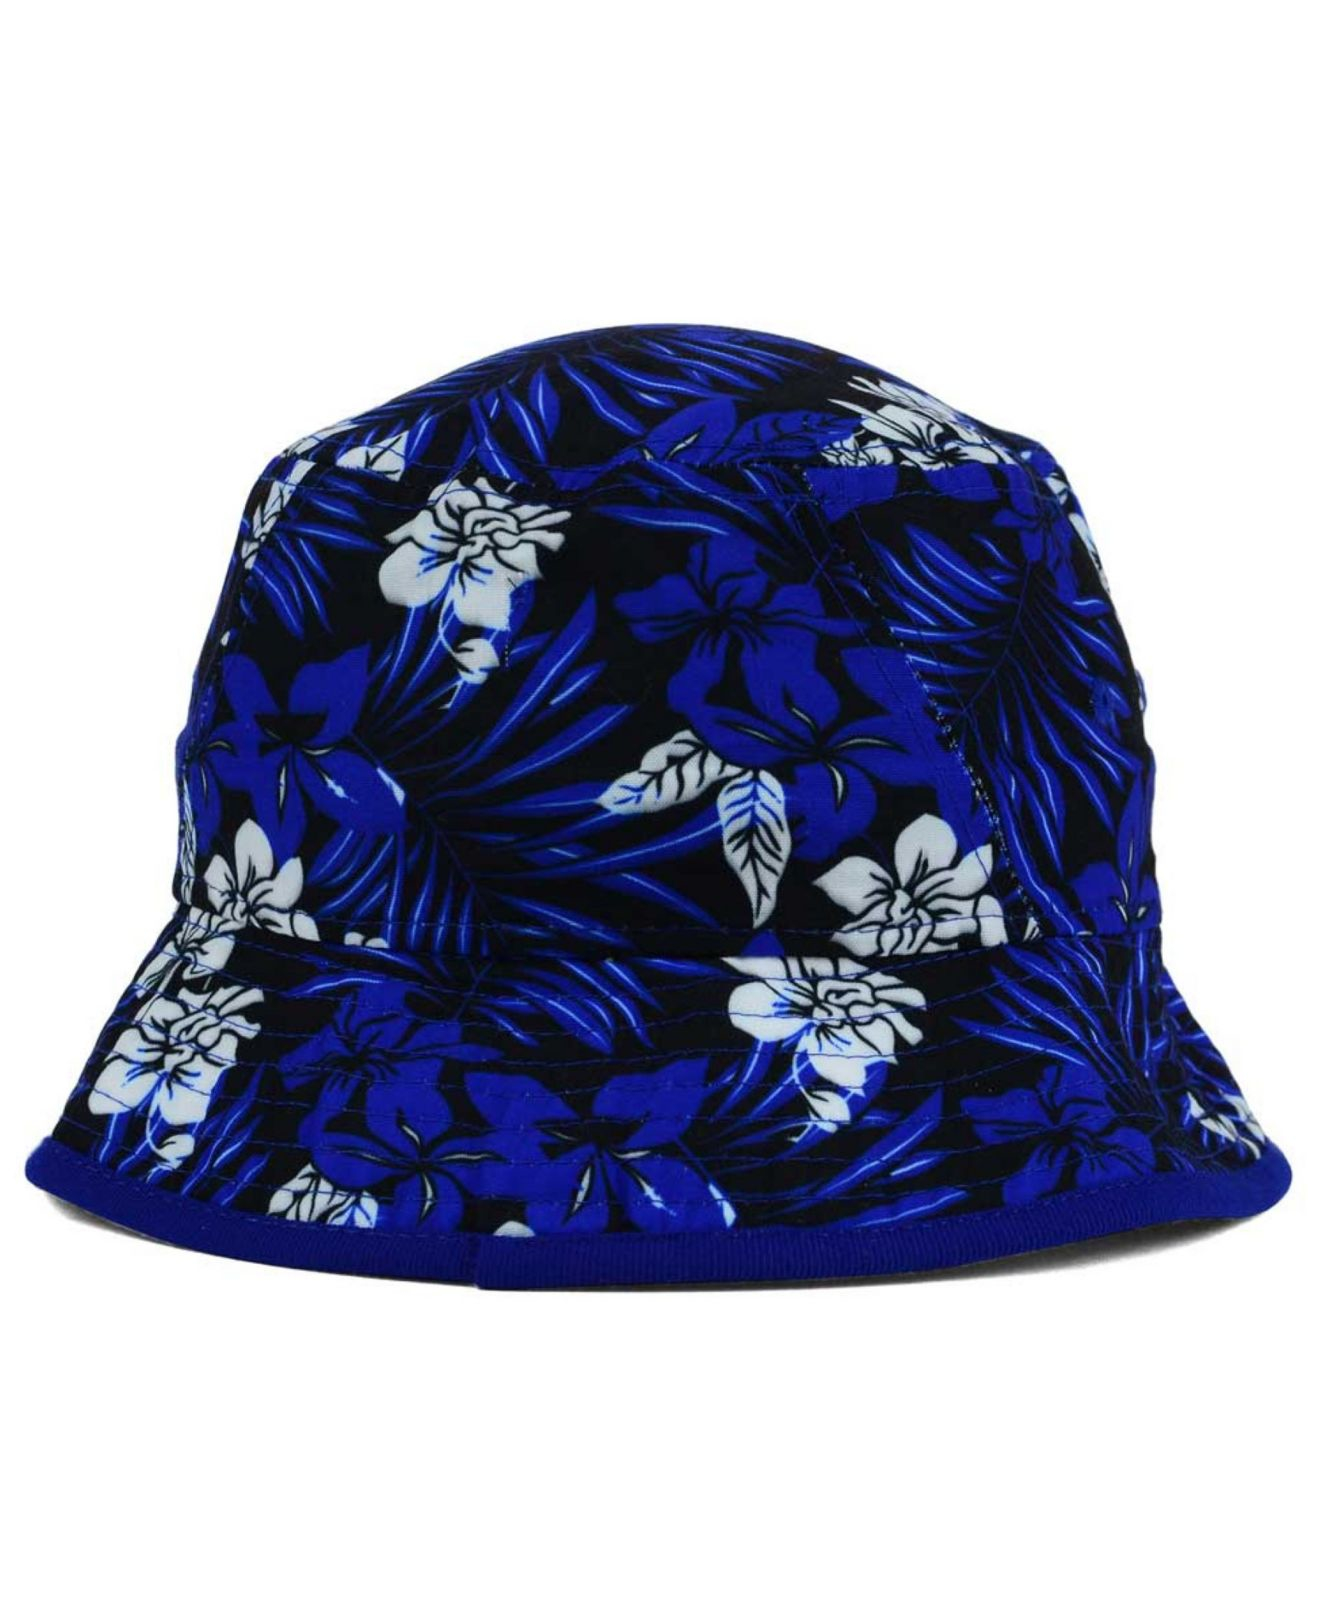 big sale 0b466 1bf84 KTZ Orlando Magic Wowie Bucket Hat in Blue for Men - Lyst